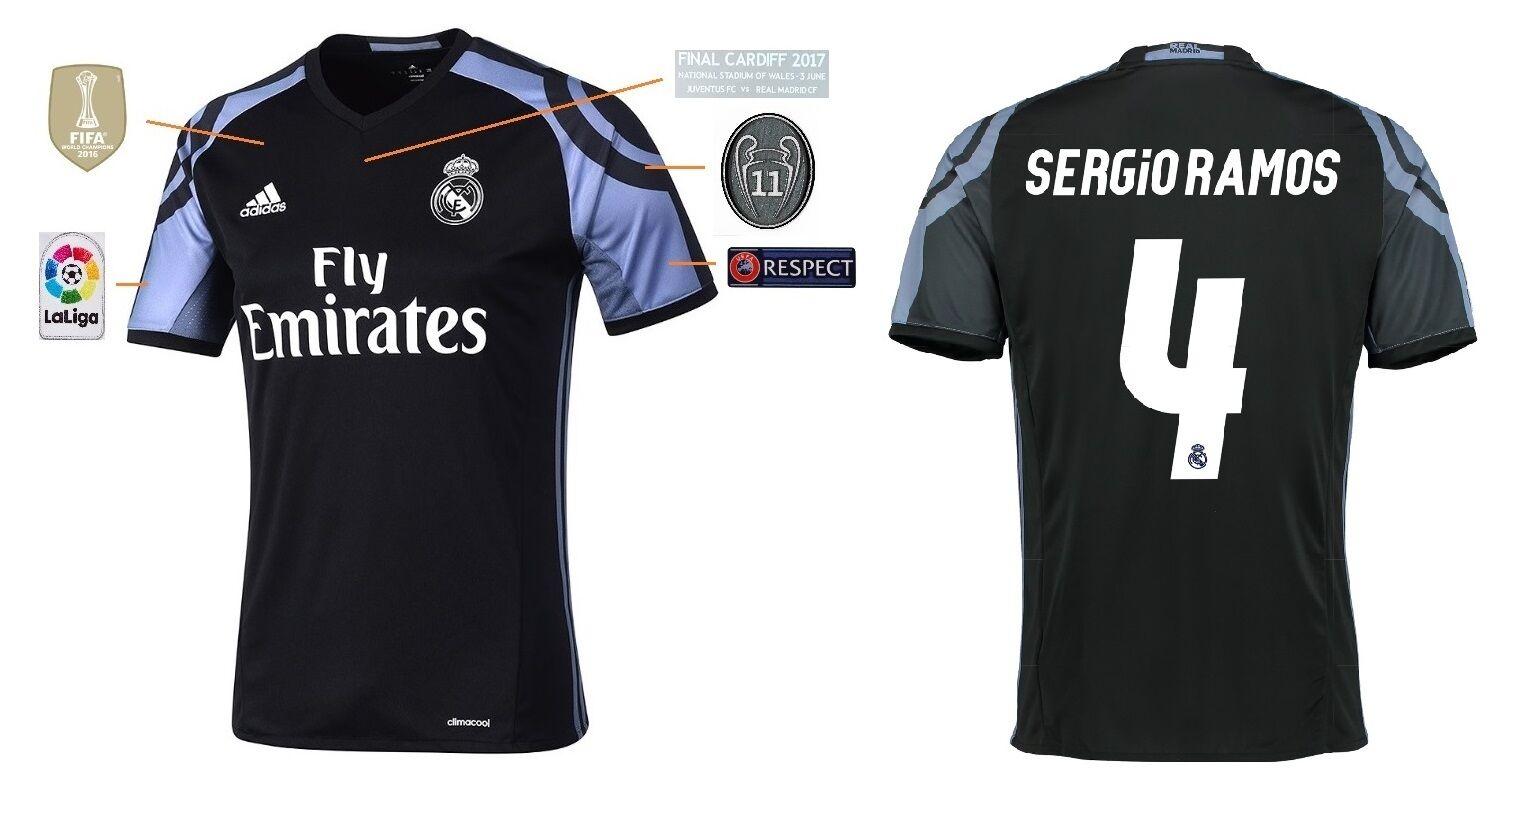 Trikot Real Madrid Third Champions League Final Cardiff 2017 - Sergio Ramos 4